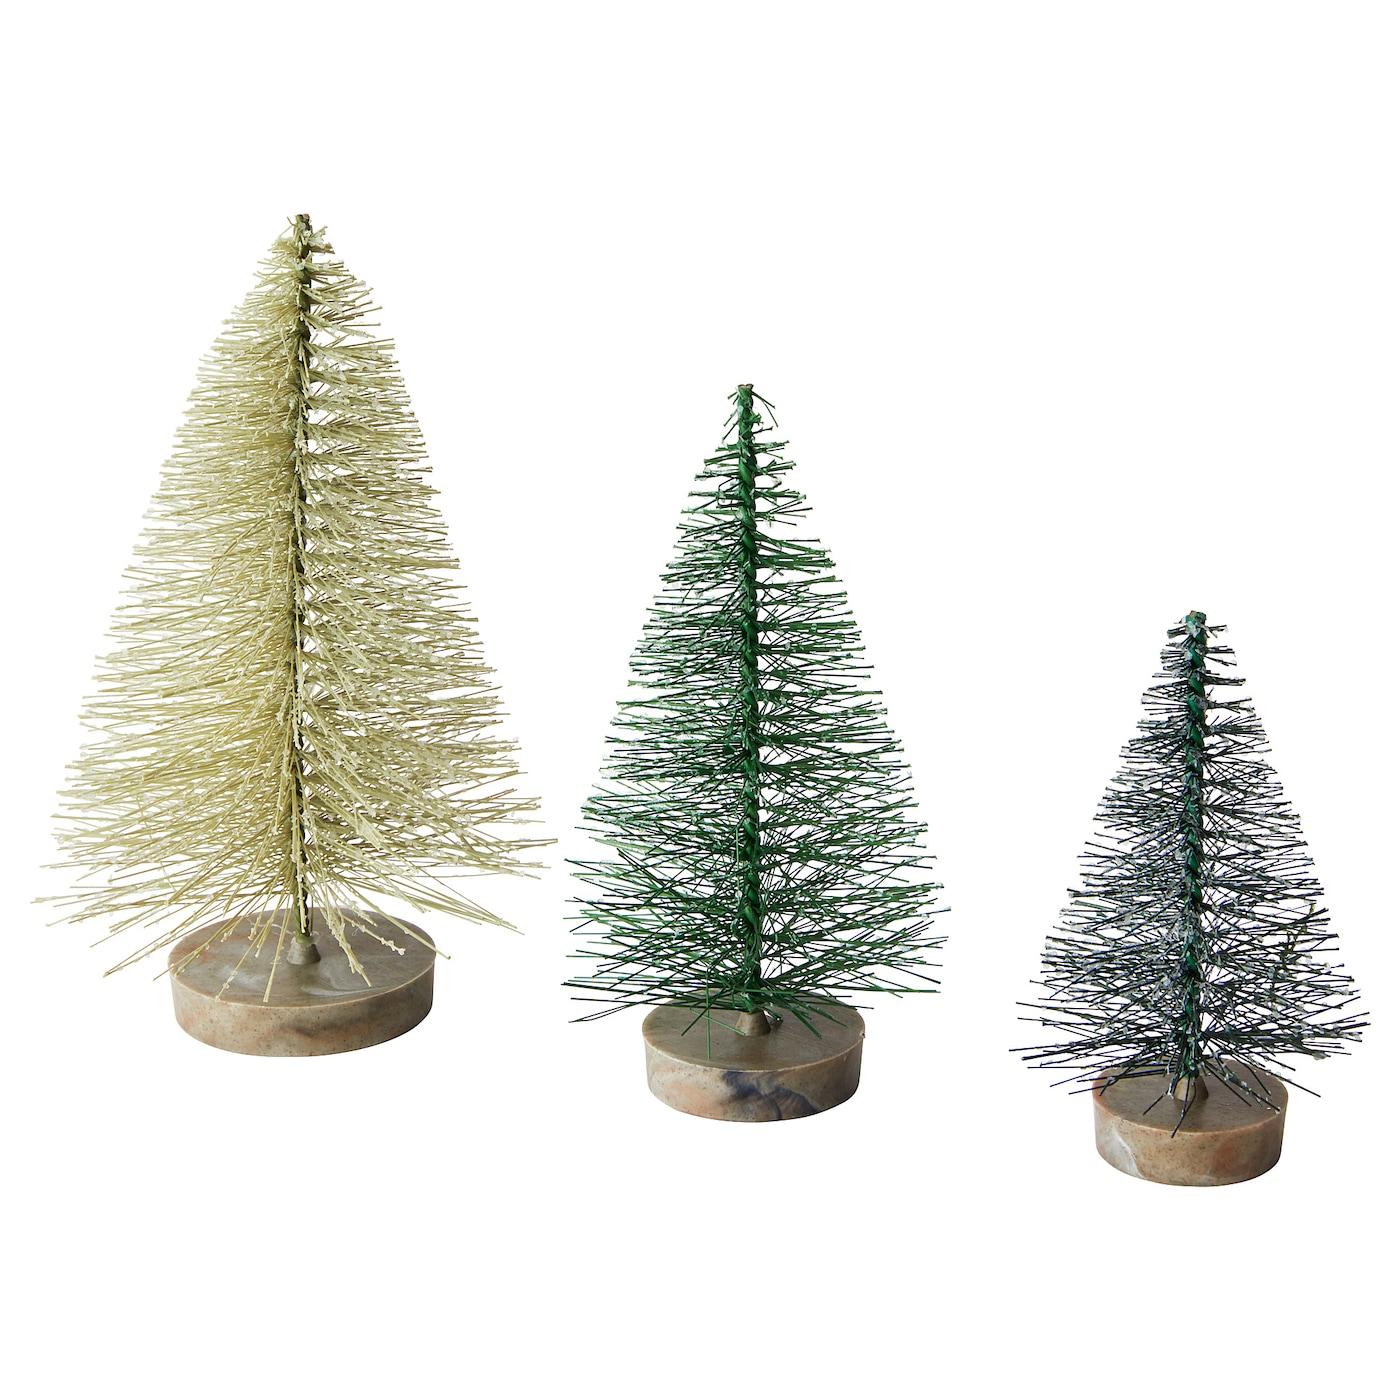 Christmas decorations | IKEA Online